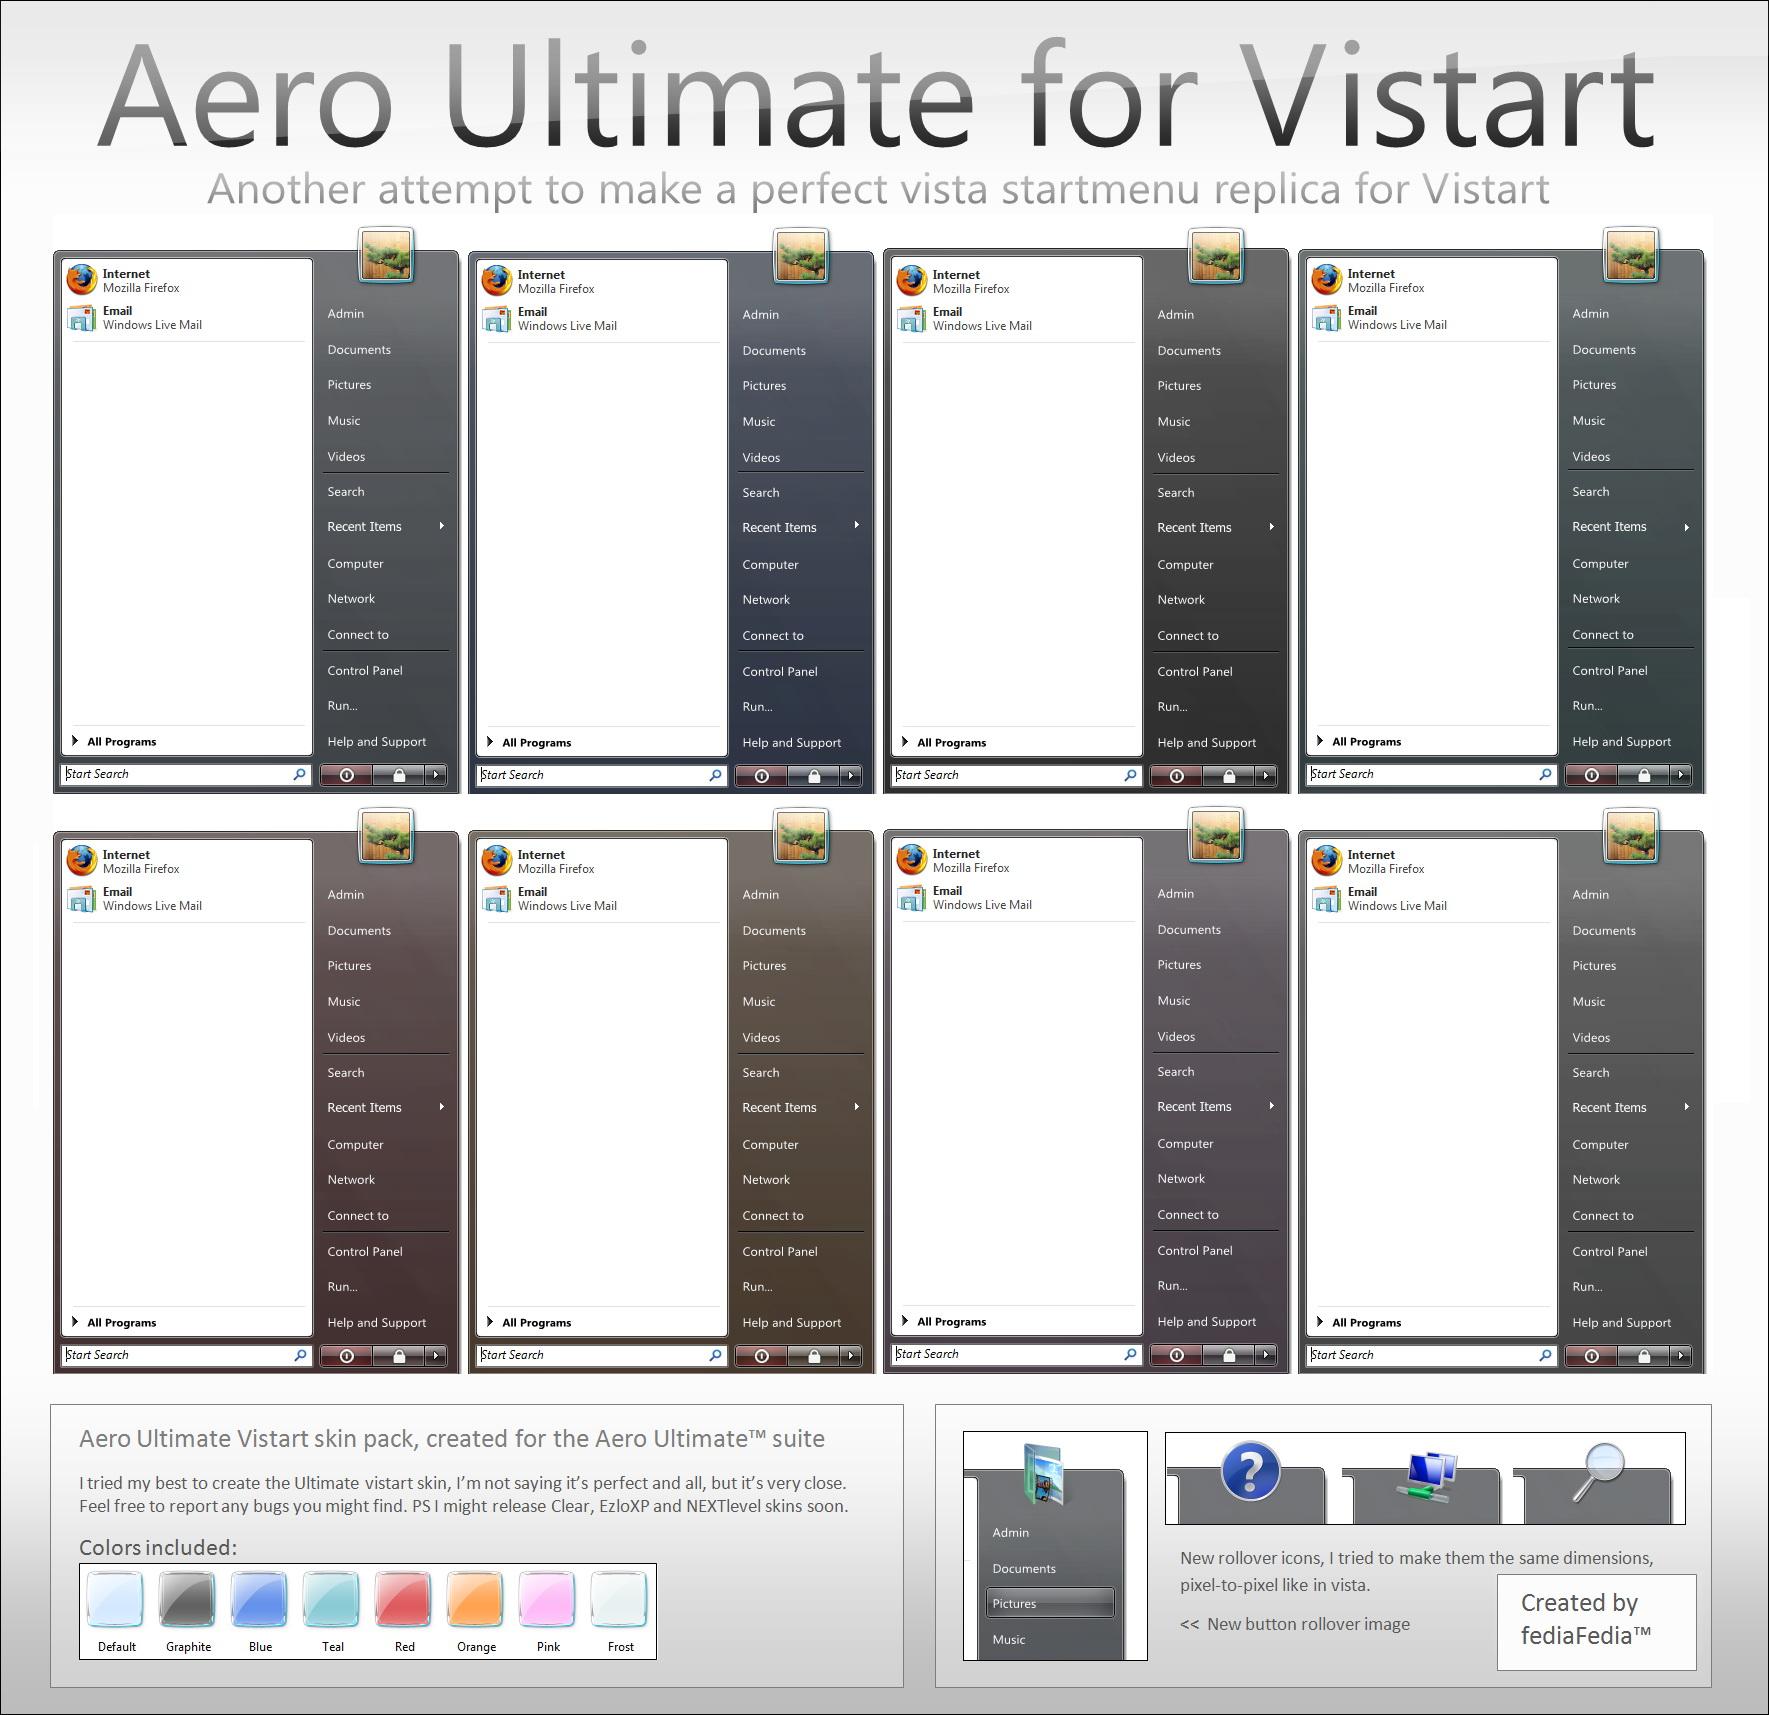 Aero Ultimate for Vistart